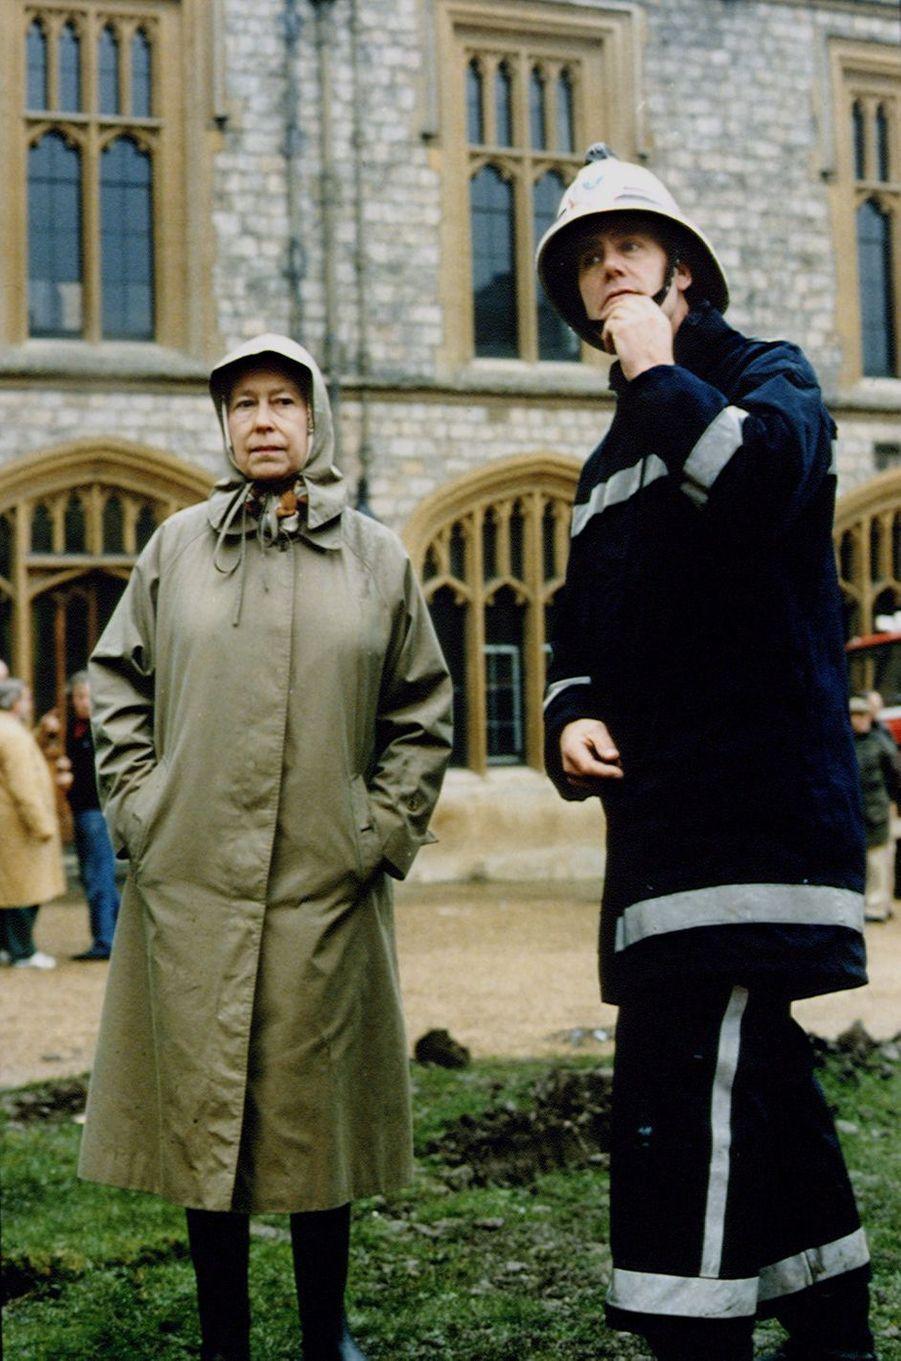 La reine Elizabeth II au château de Windsor, le 21 novembre 1992